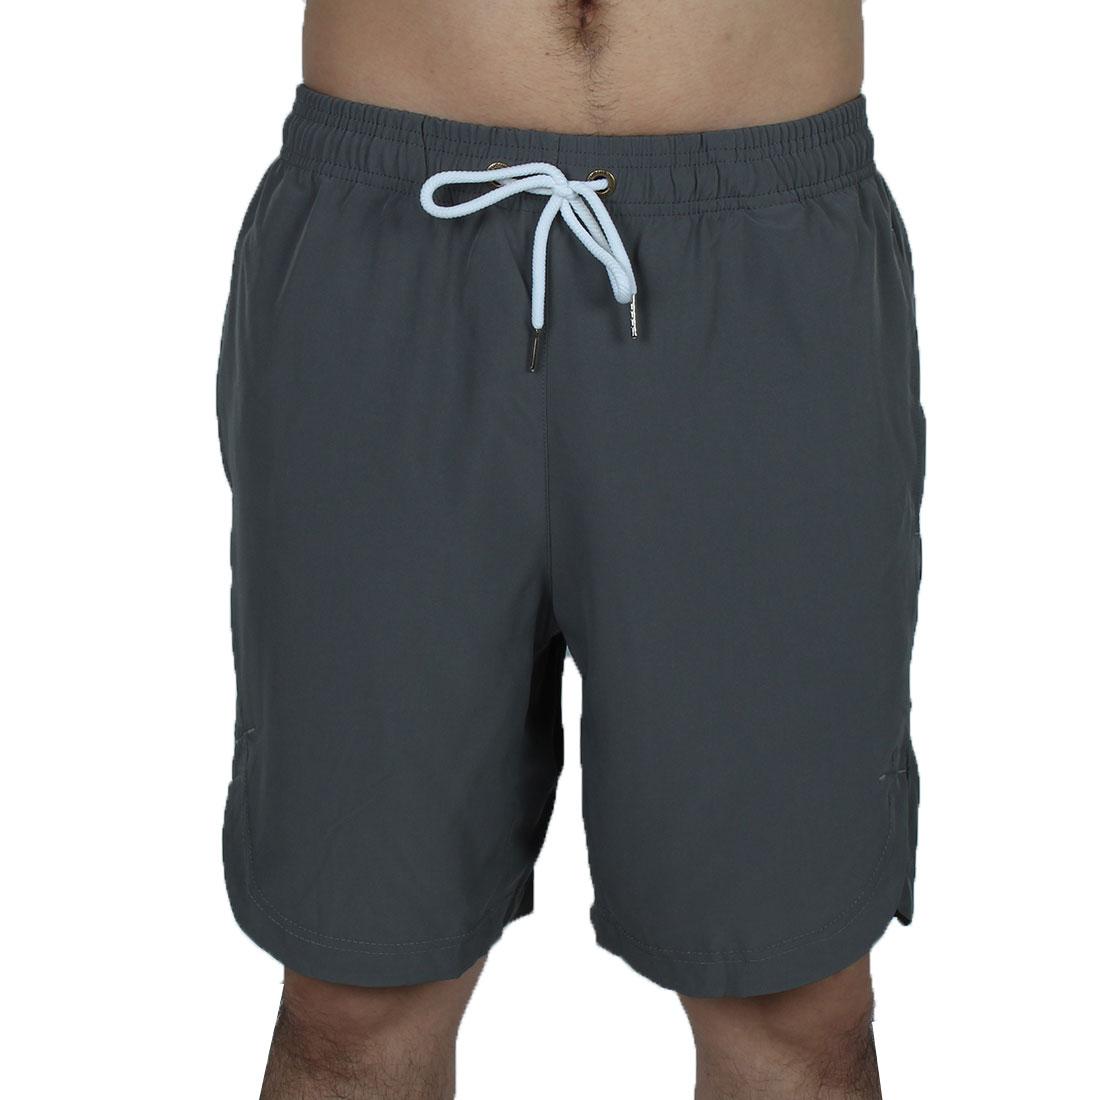 Men Athletics Running Polyester Summer Beach Surf Board Shorts Pants Gray W32